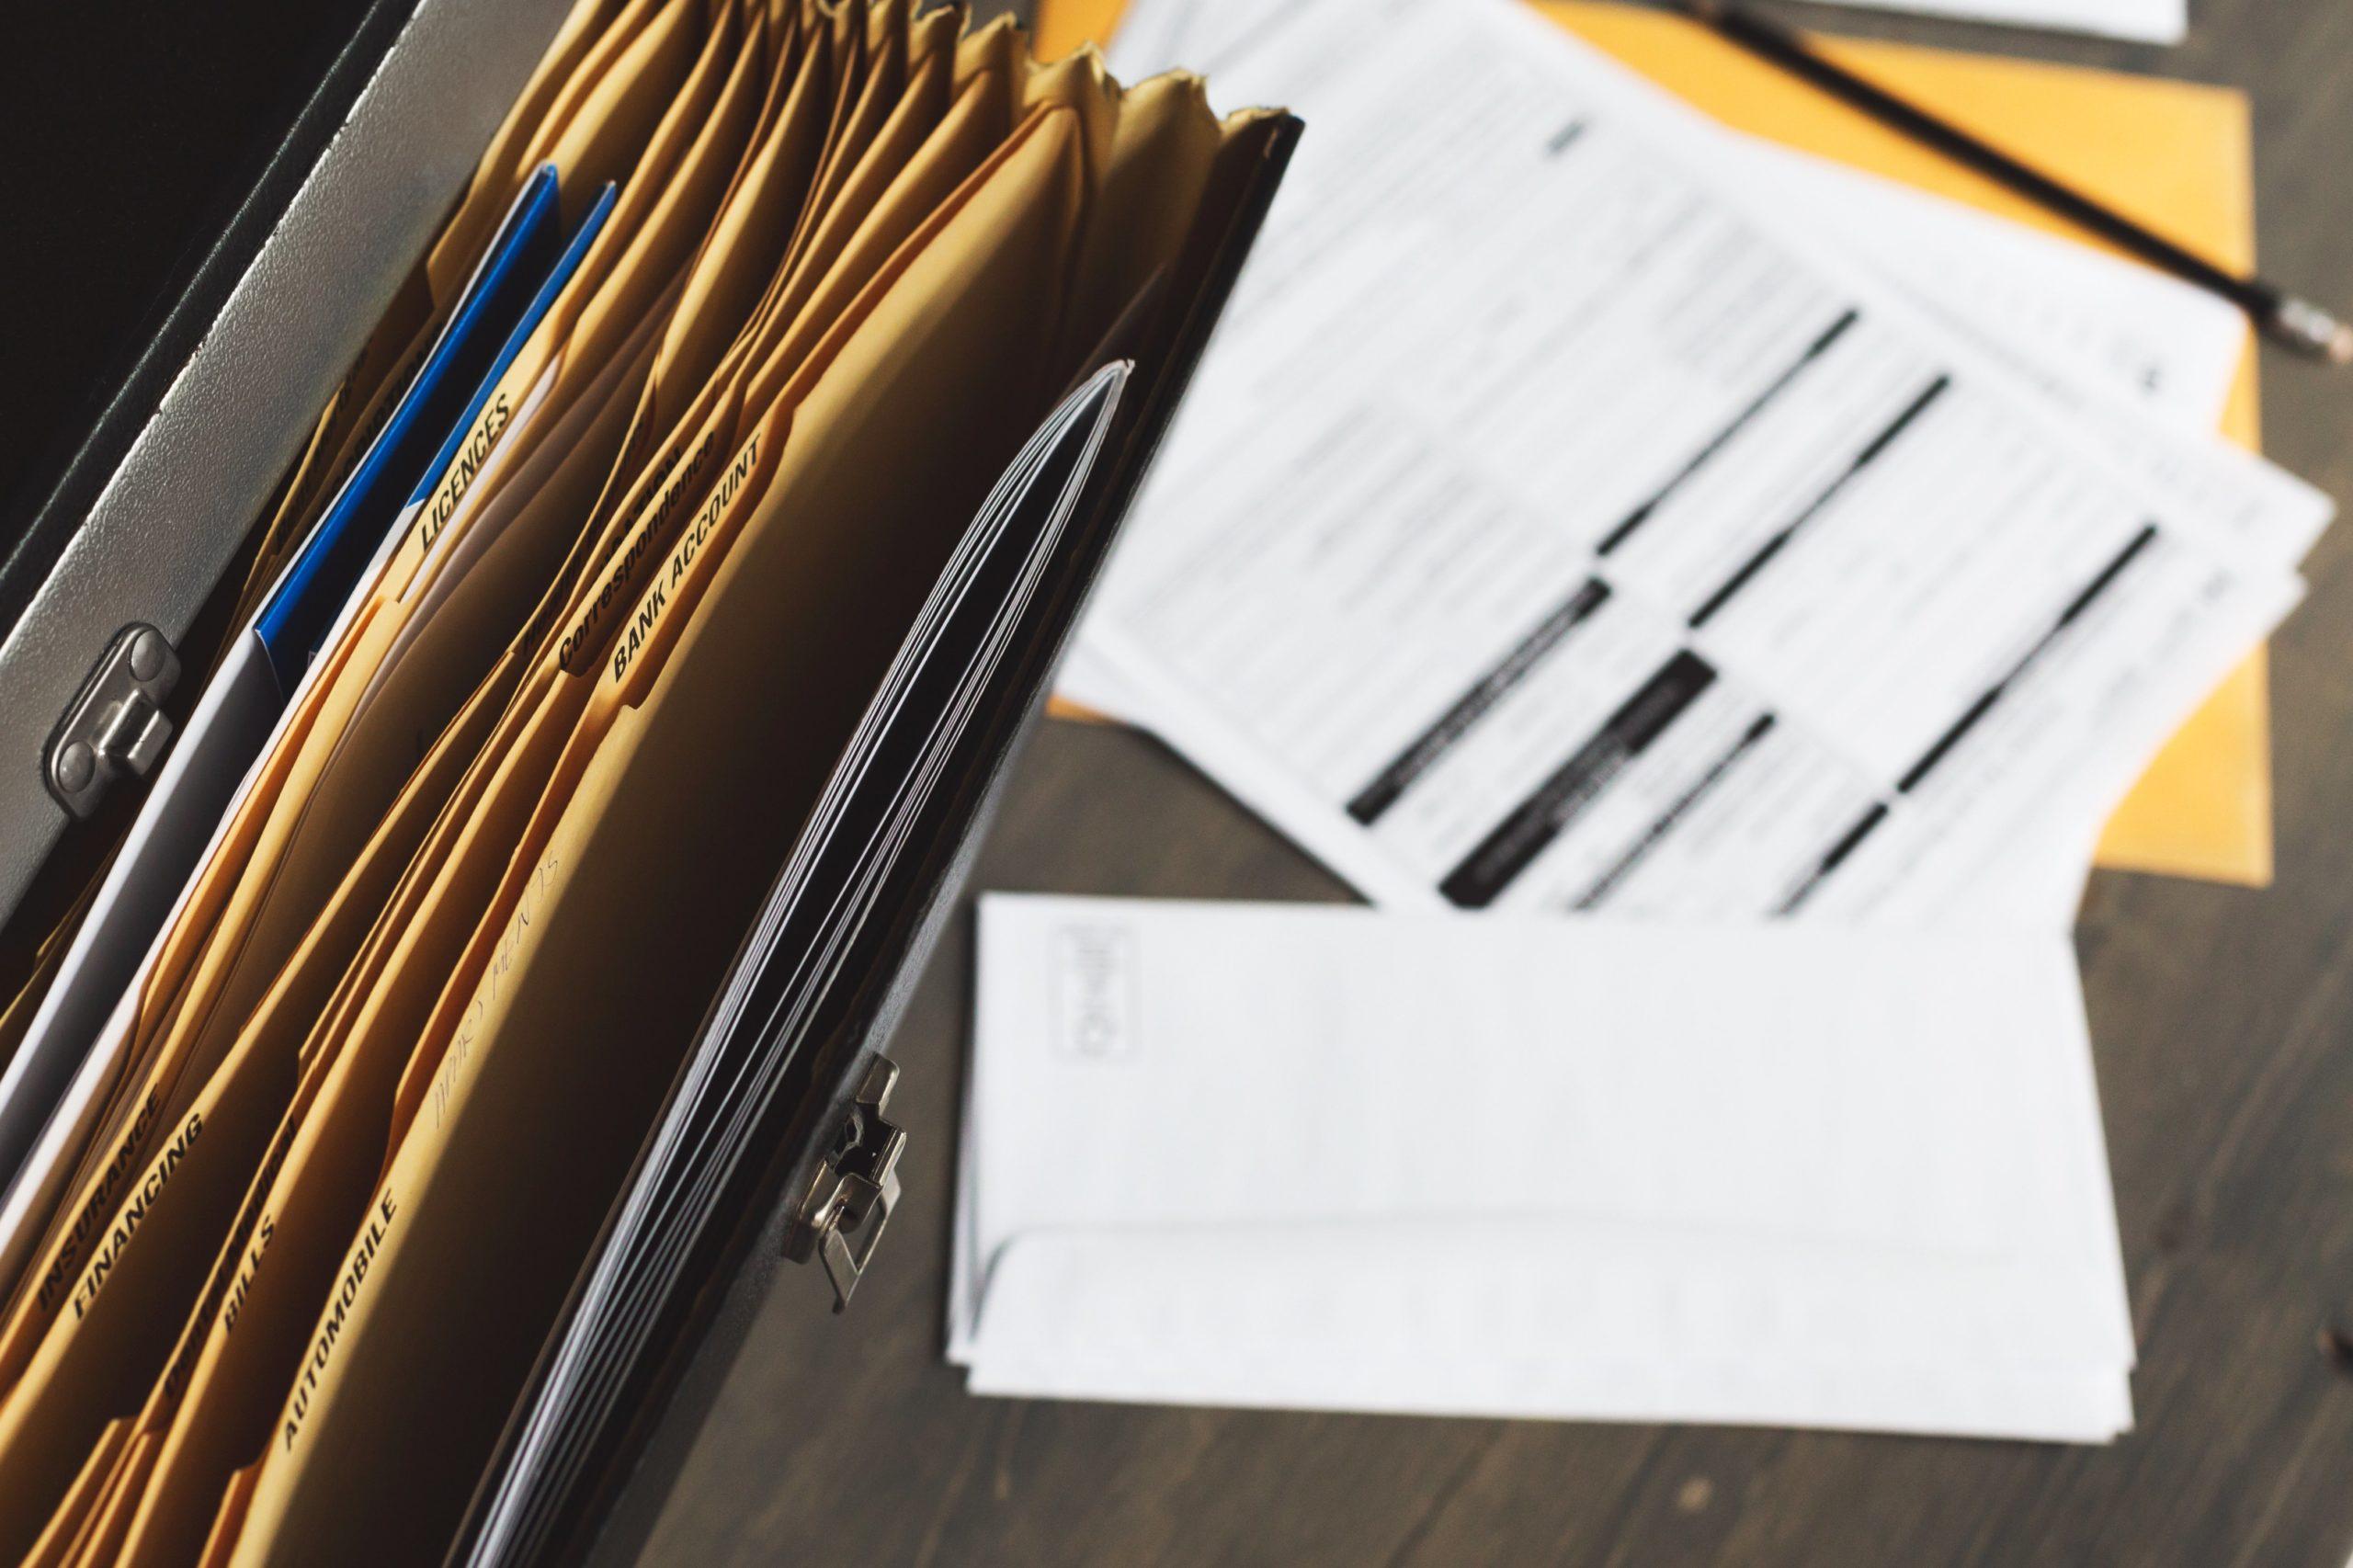 Dossiers administratifs organisés